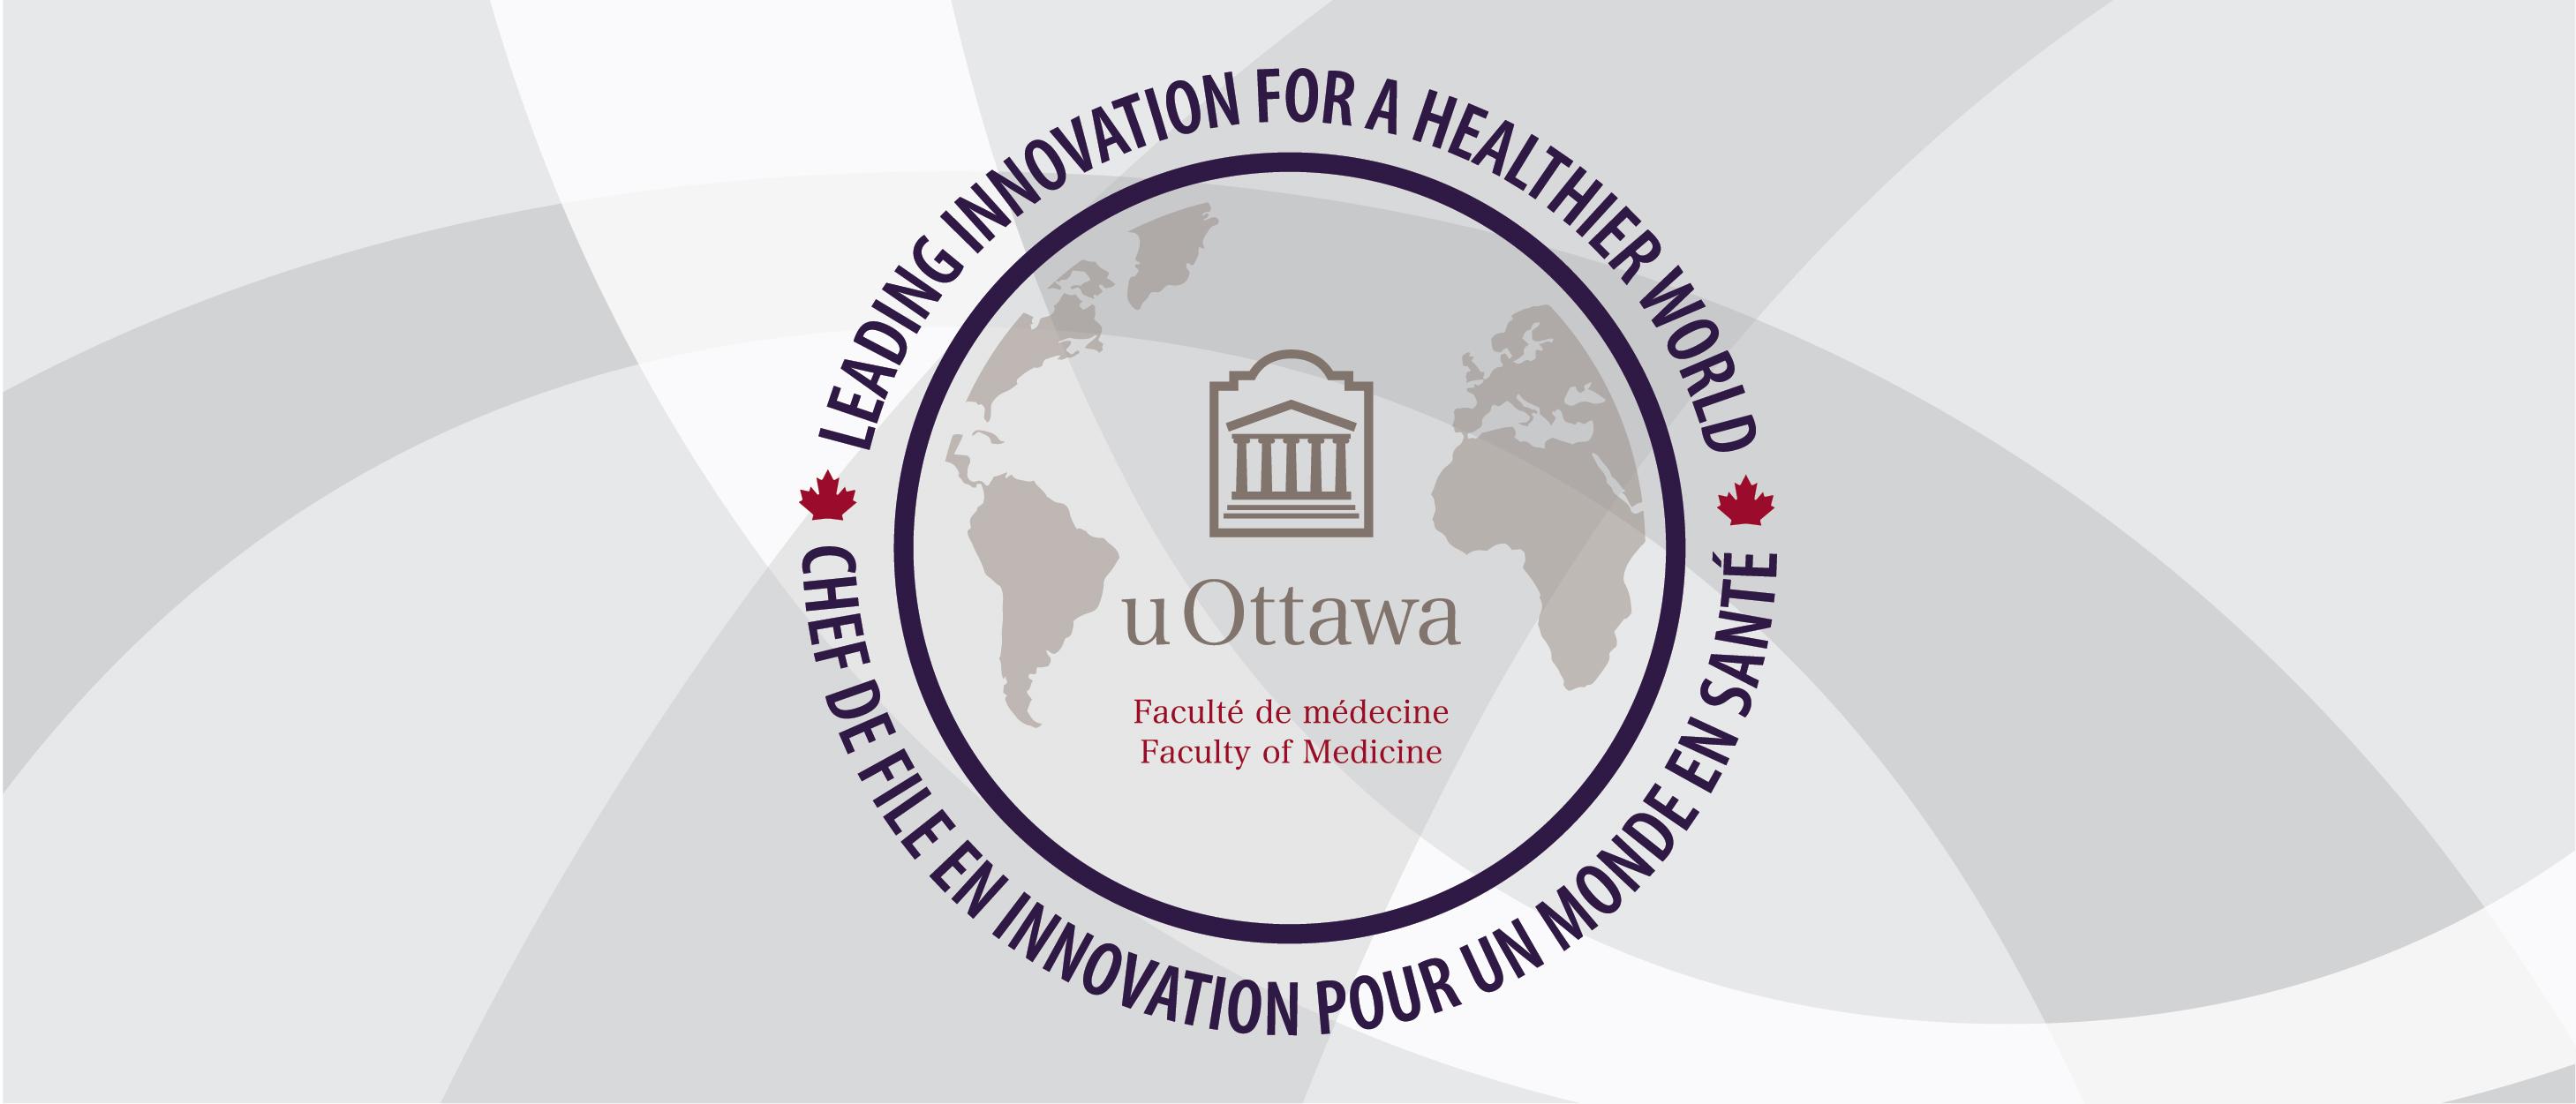 uOttawa Faculté de médecine logo banner